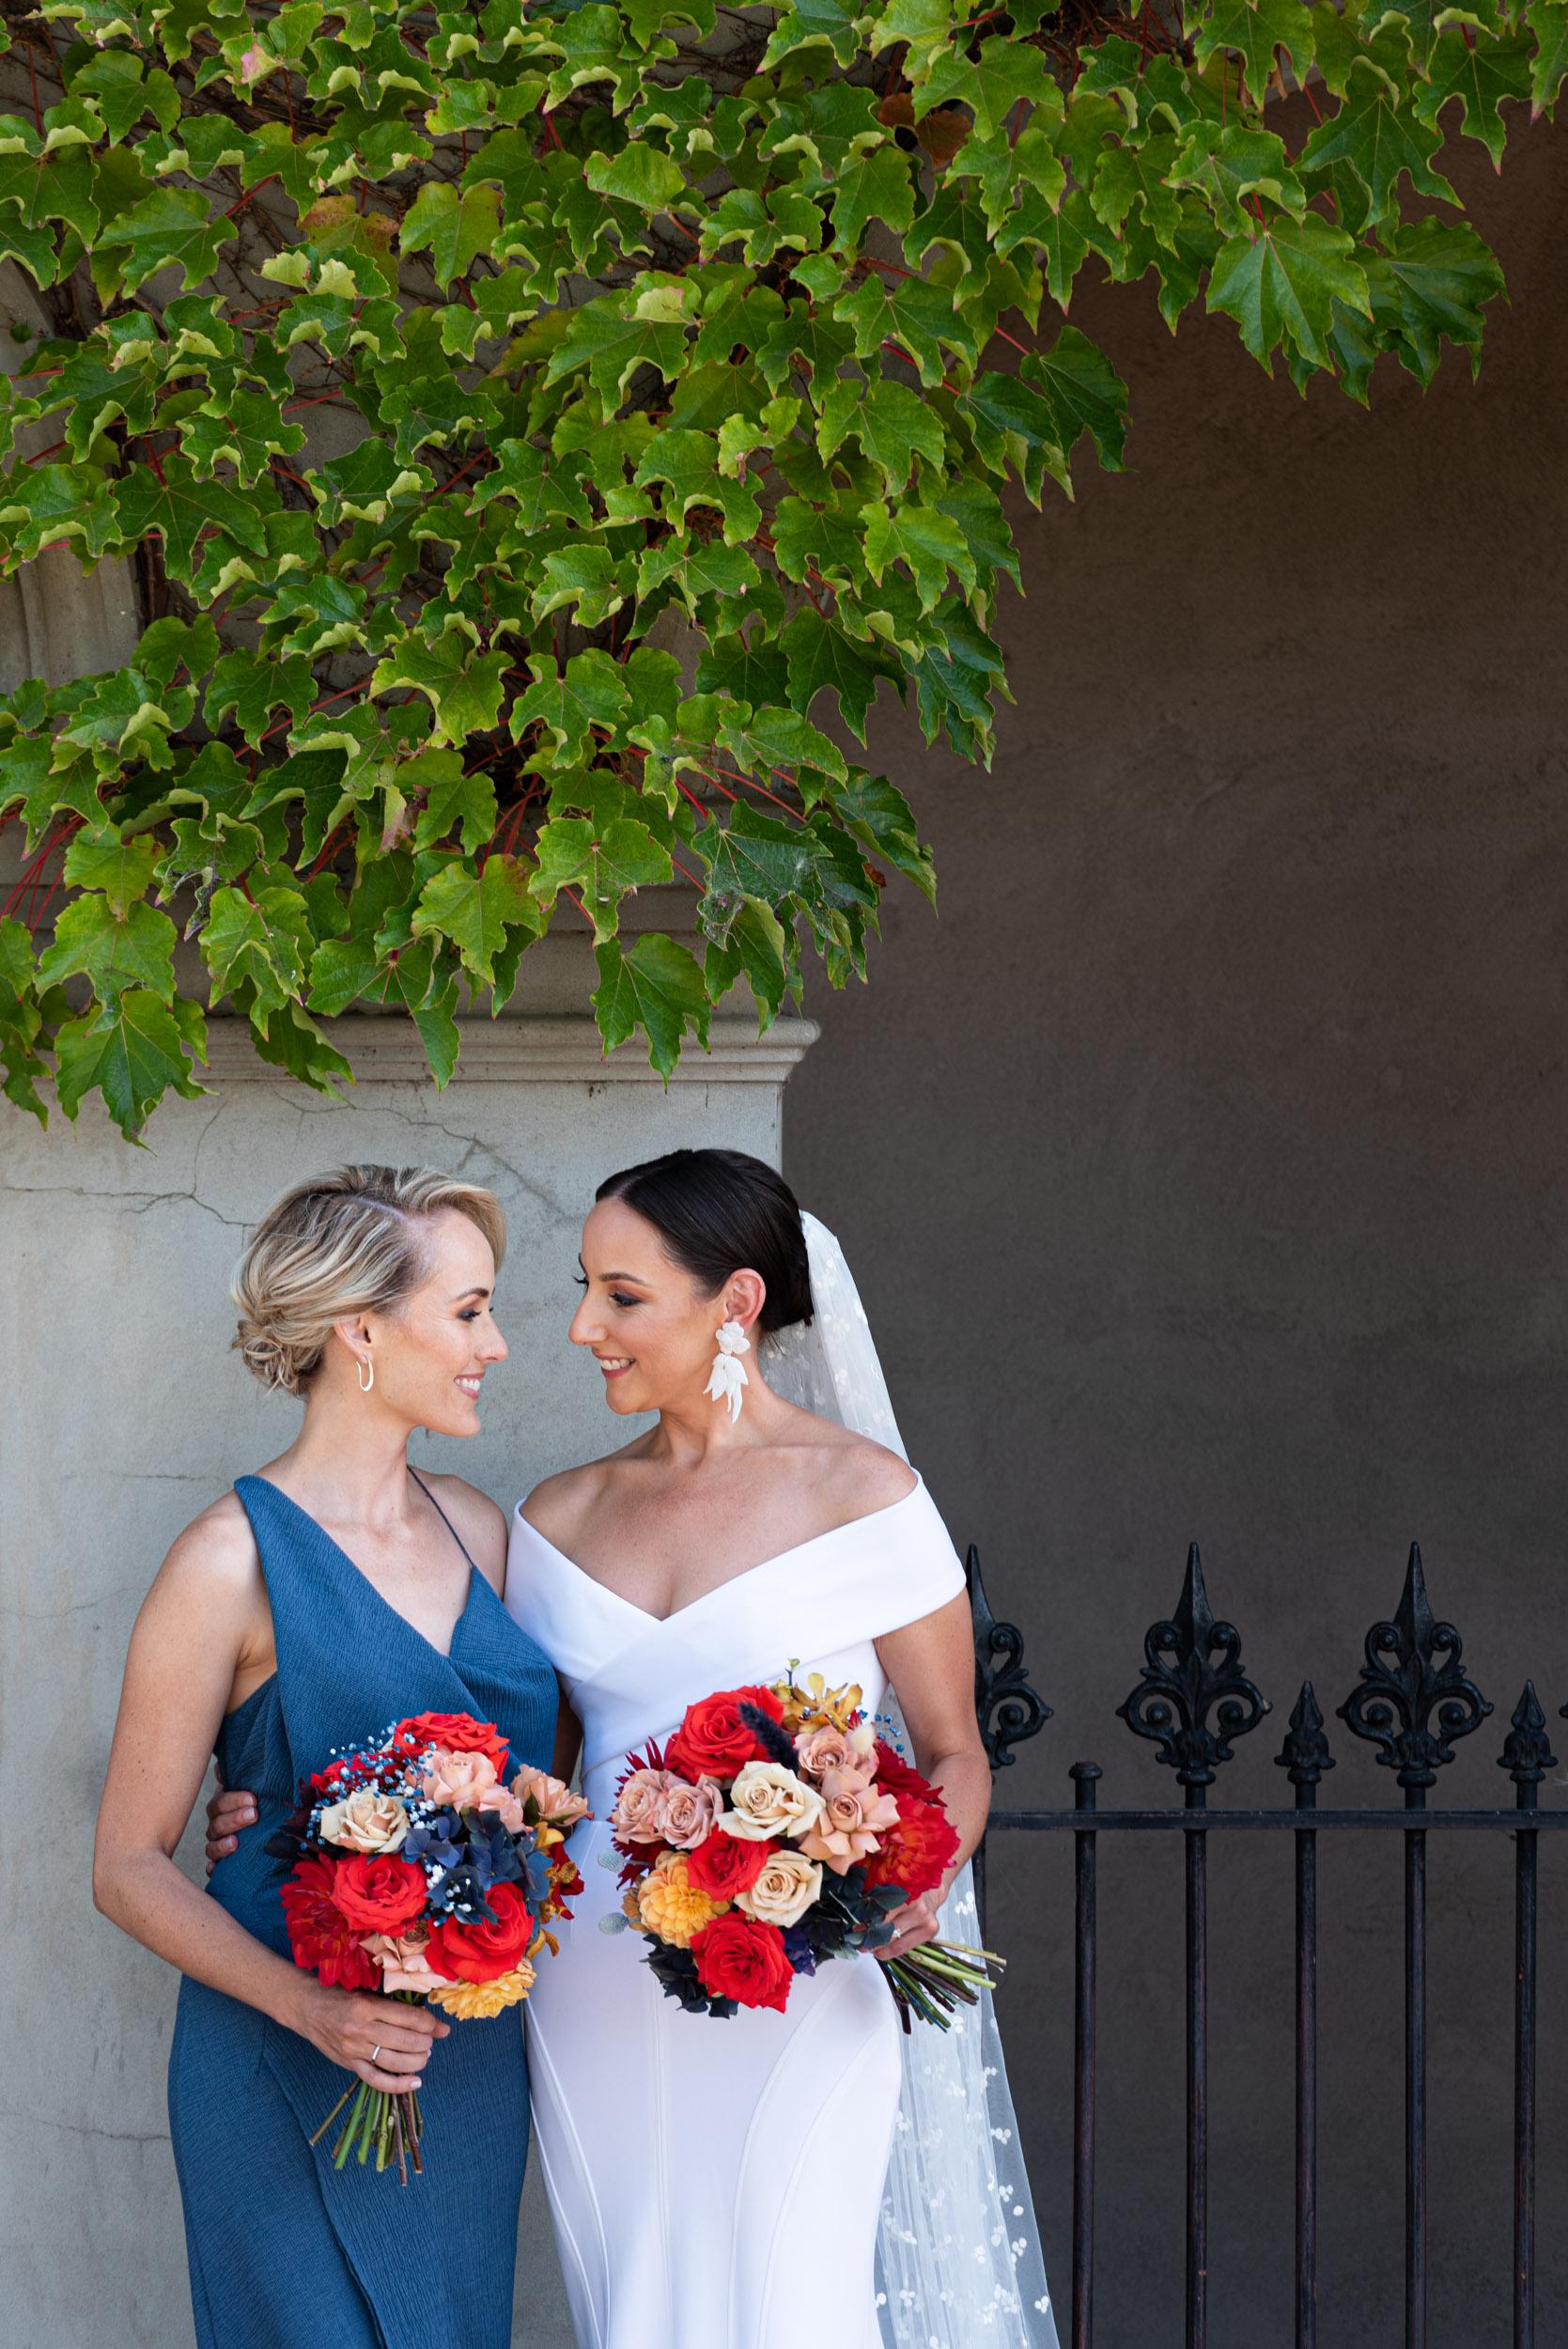 Bride, Bridesmaid, Wedding Day, Wedding Dress, Georgia Young Couture, Love Alfalfa Florals, Melbourne Wedding, Brad Geddes Photography, Wedding Bouquet